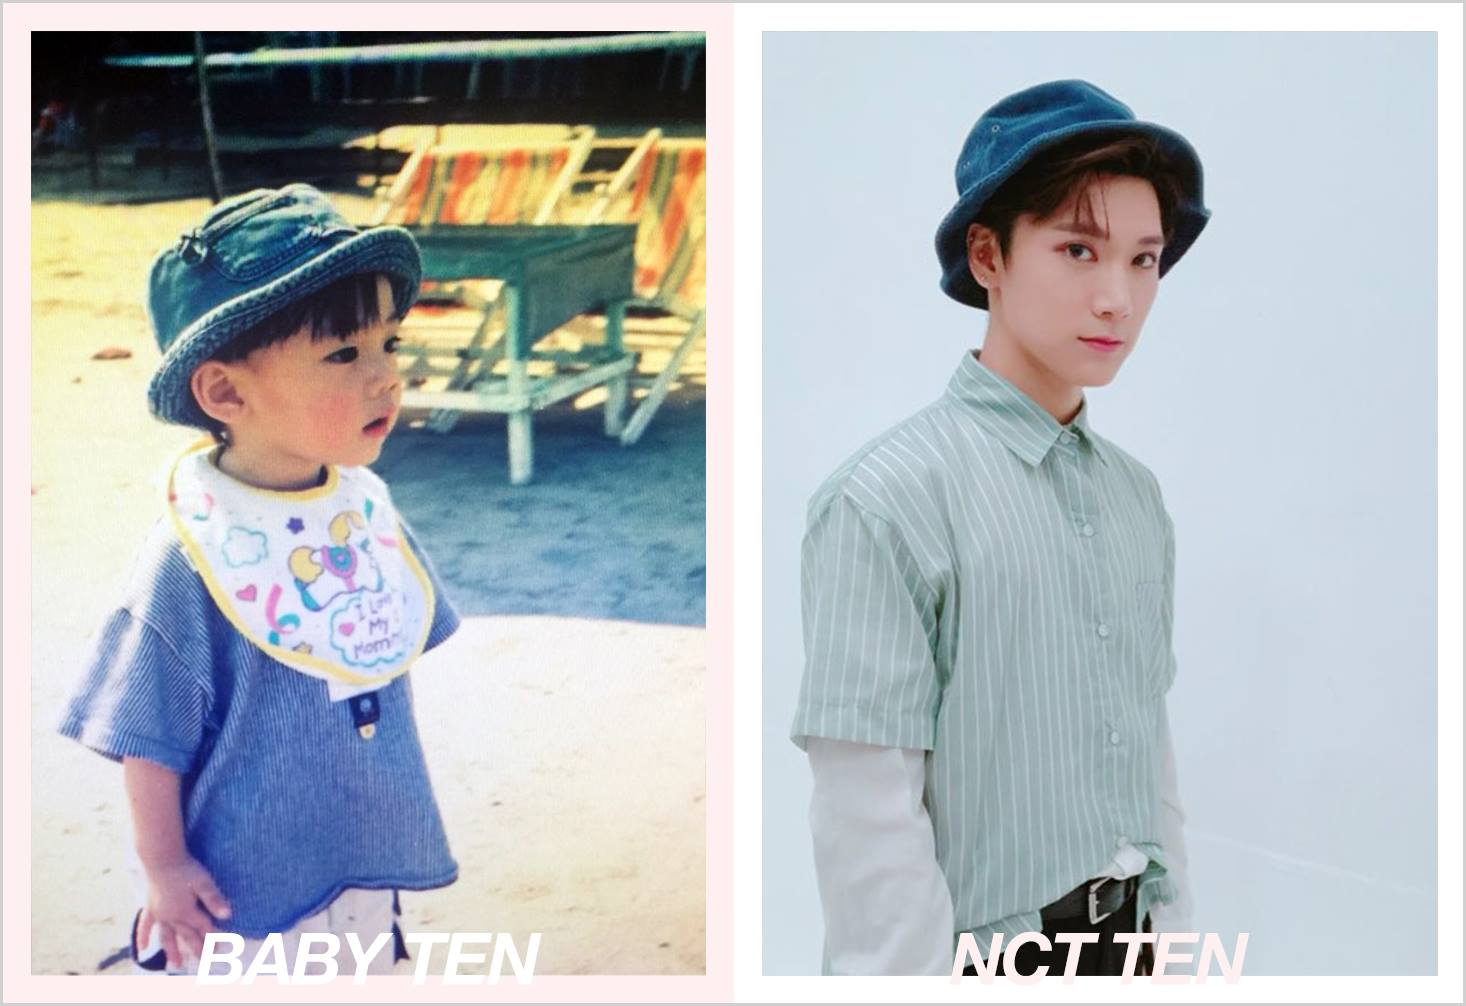 TOP 6 NCT - TEN 得票數 1,421,698票 身為NCT唯一的泰國籍成員,TEN有著深邃的五官及獨有的魅力,難怪能在那麼多人的NCT中殺出血路,得到第6名阿!